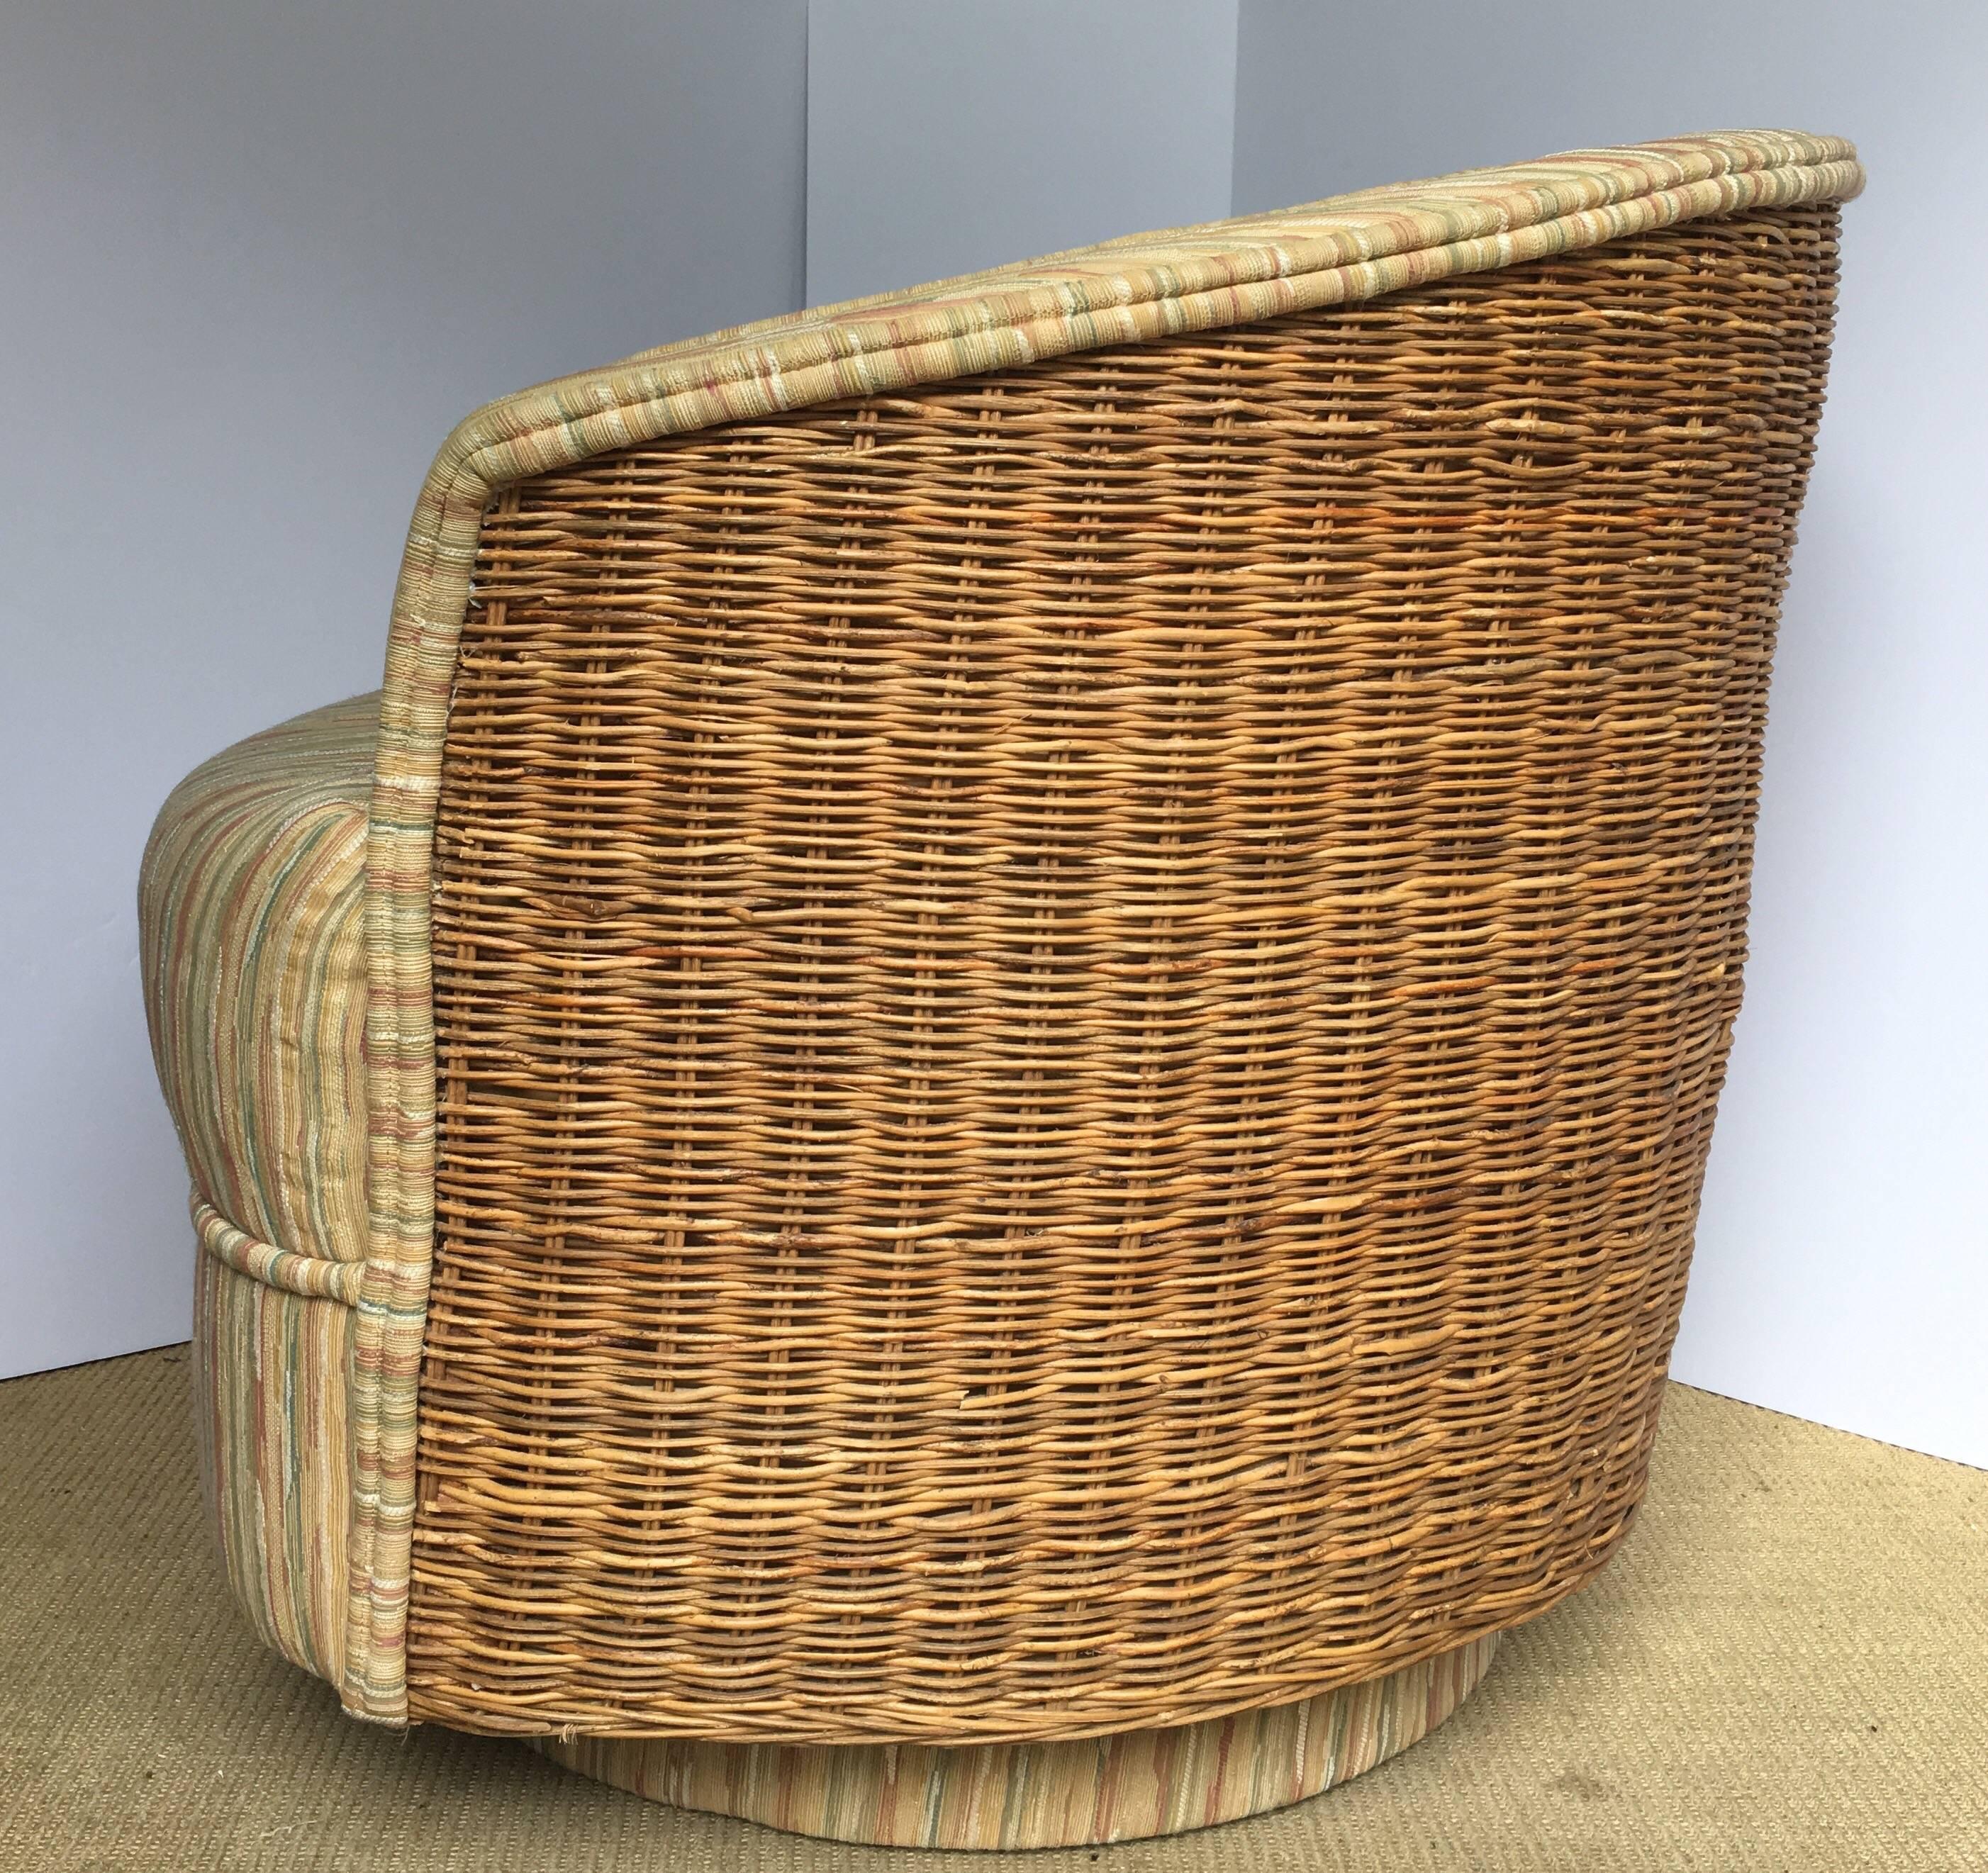 Mid Century Modern Milo Baughman Style Rattan Wicker Barrel Swivel Lounge  Chair In Good Condition